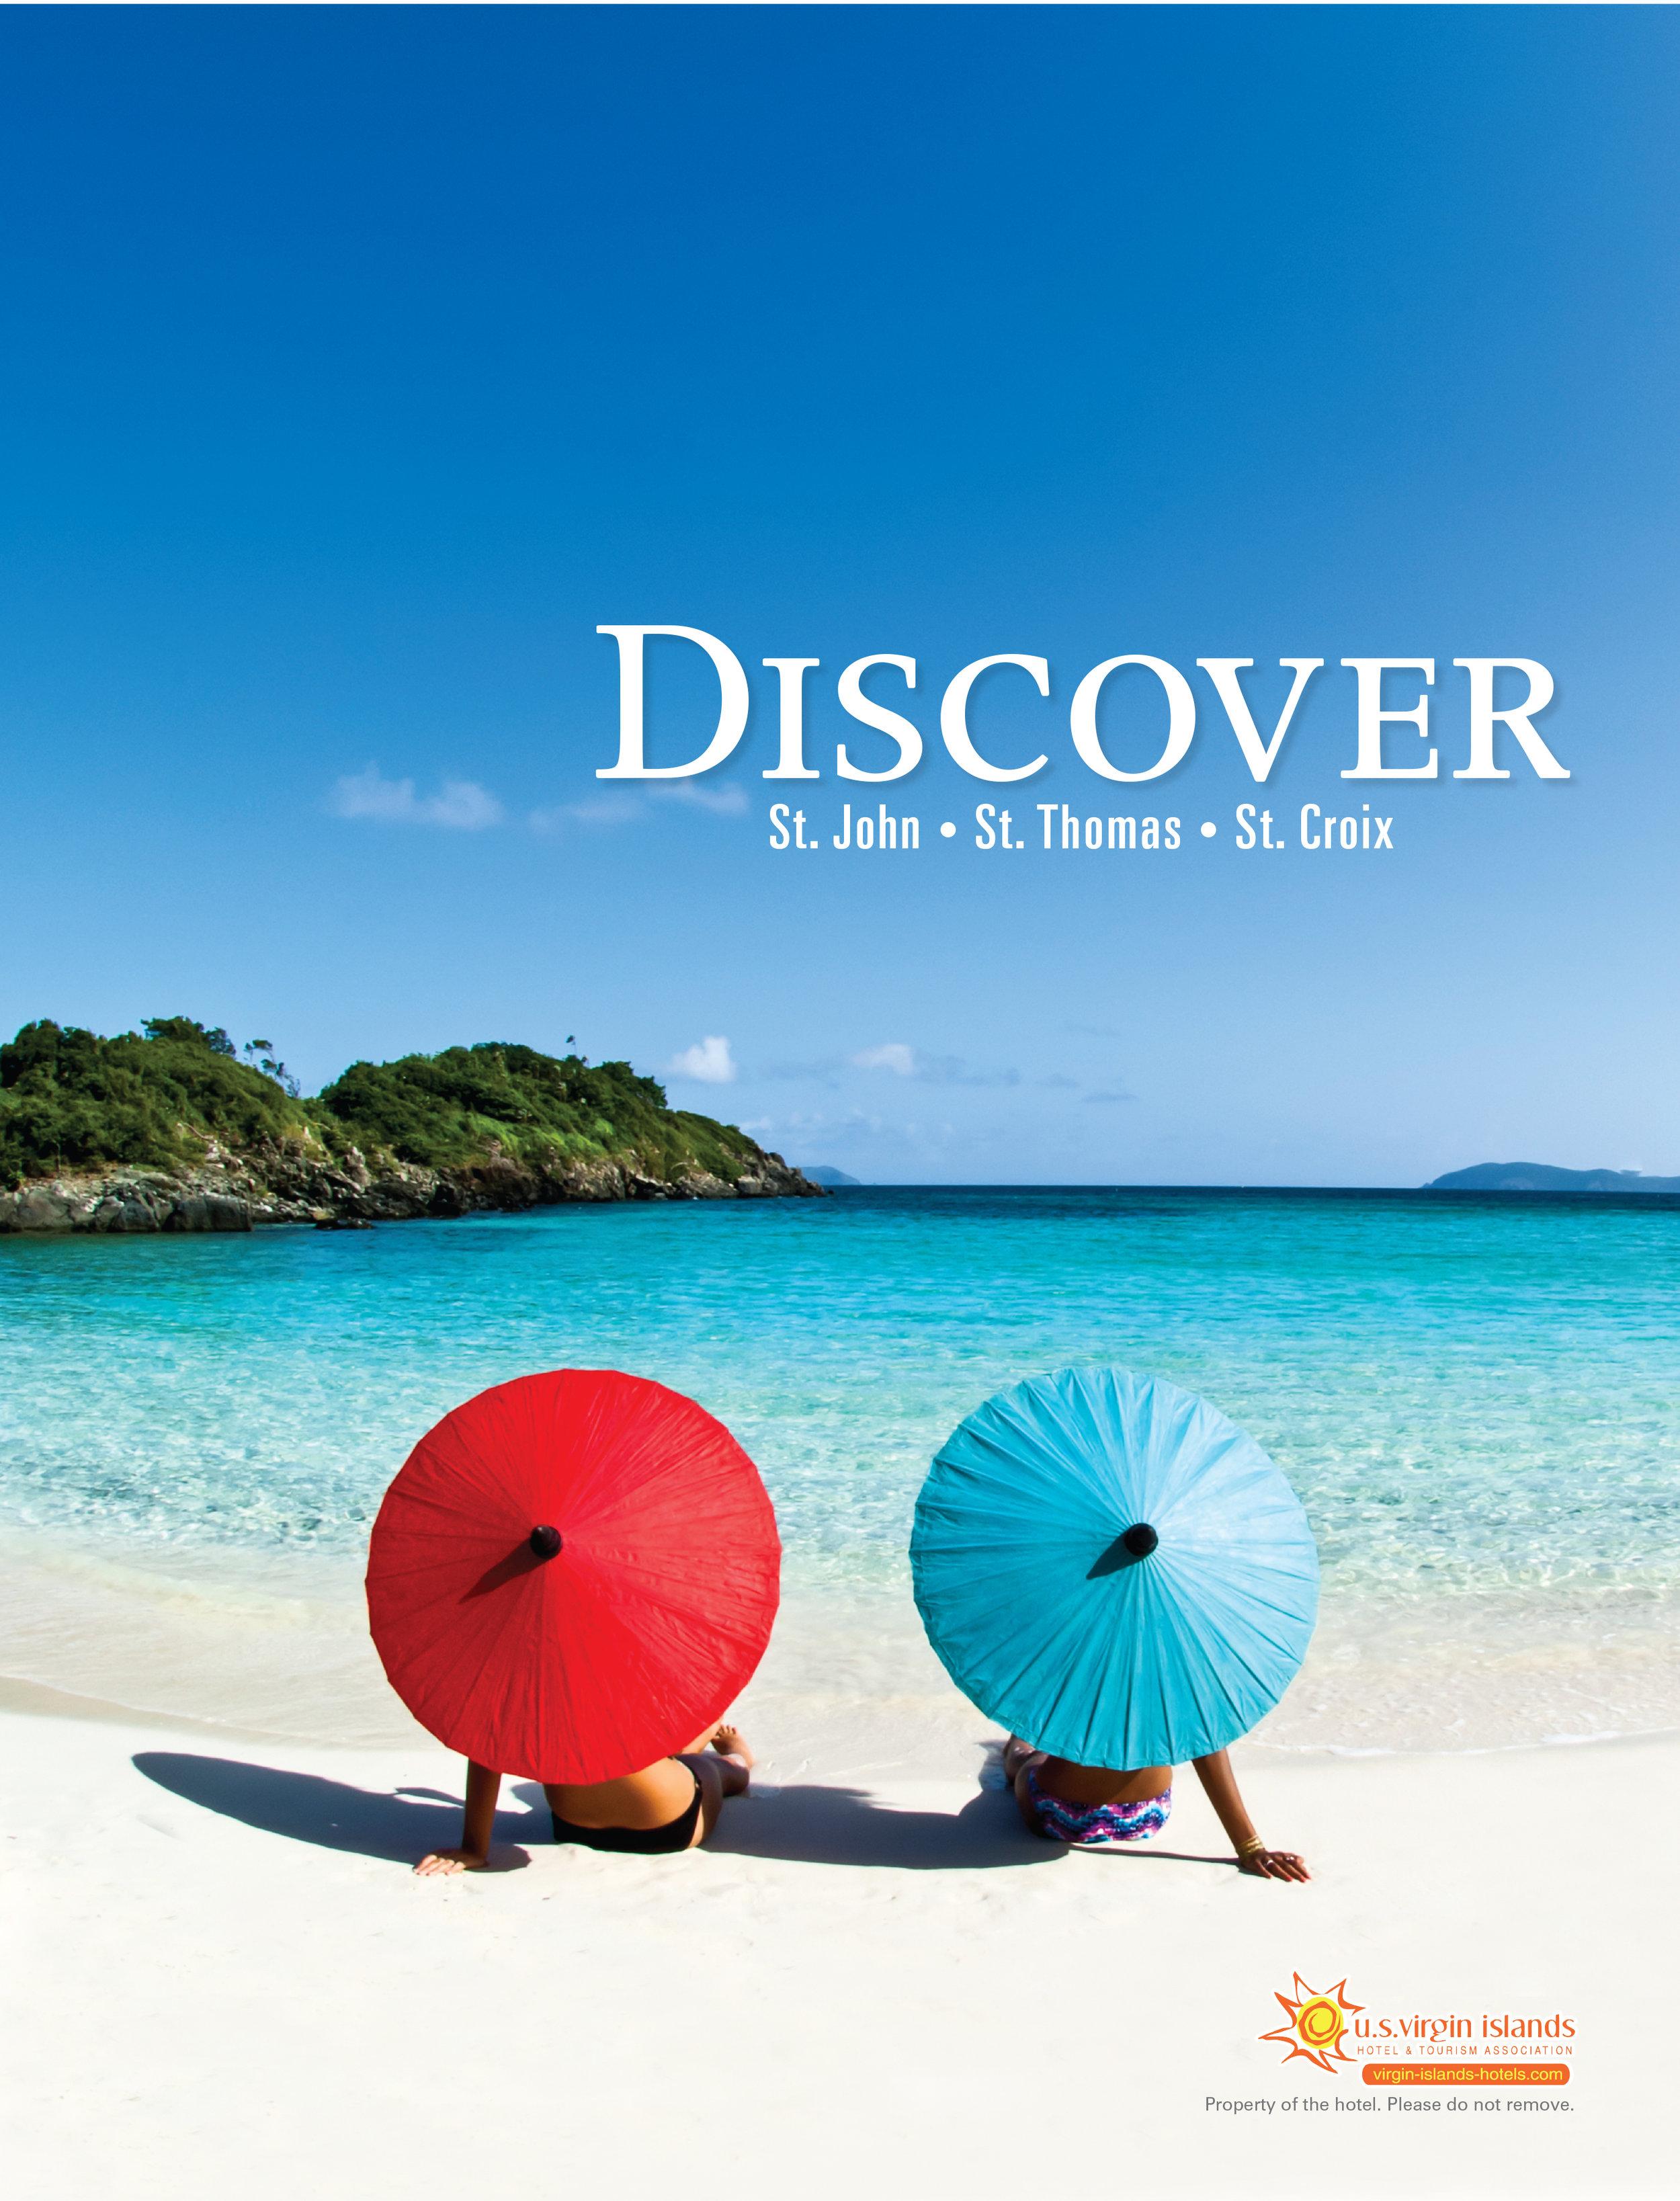 Discover St. John, St. Thomas, St. Croix